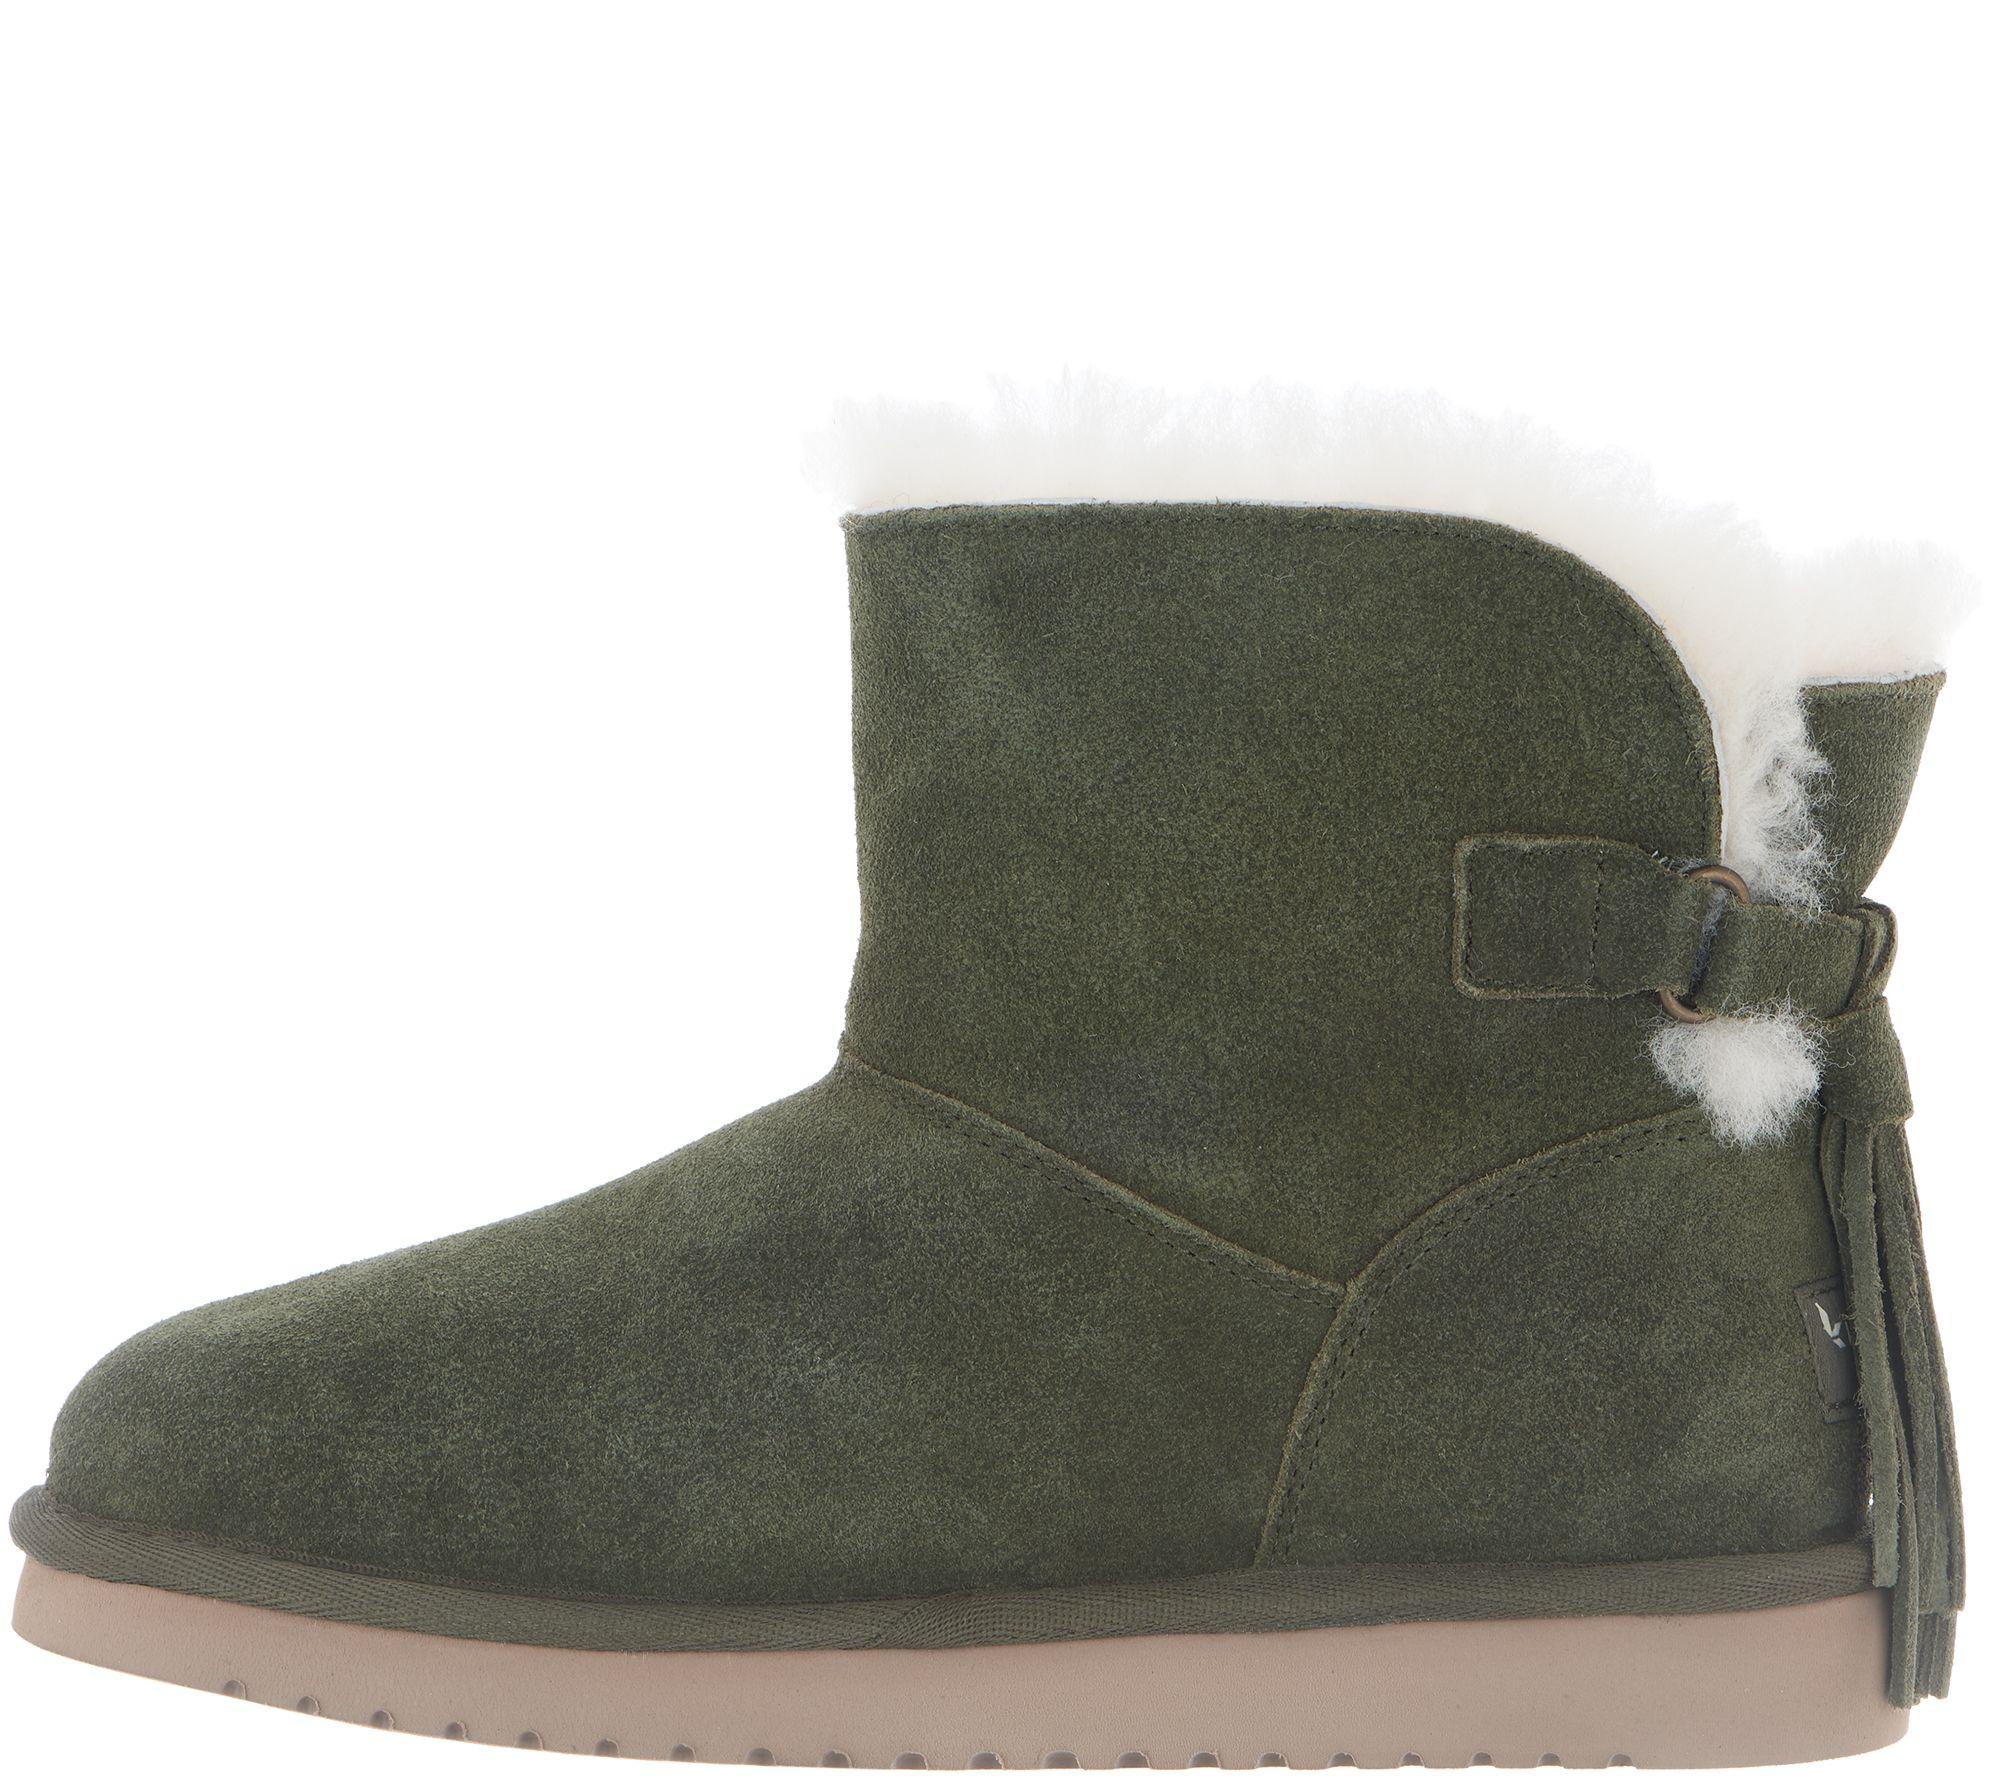 0986fa2afcd Koolaburra by UGG Suede Tassel Mini Boots - Jaelyn — QVC.com